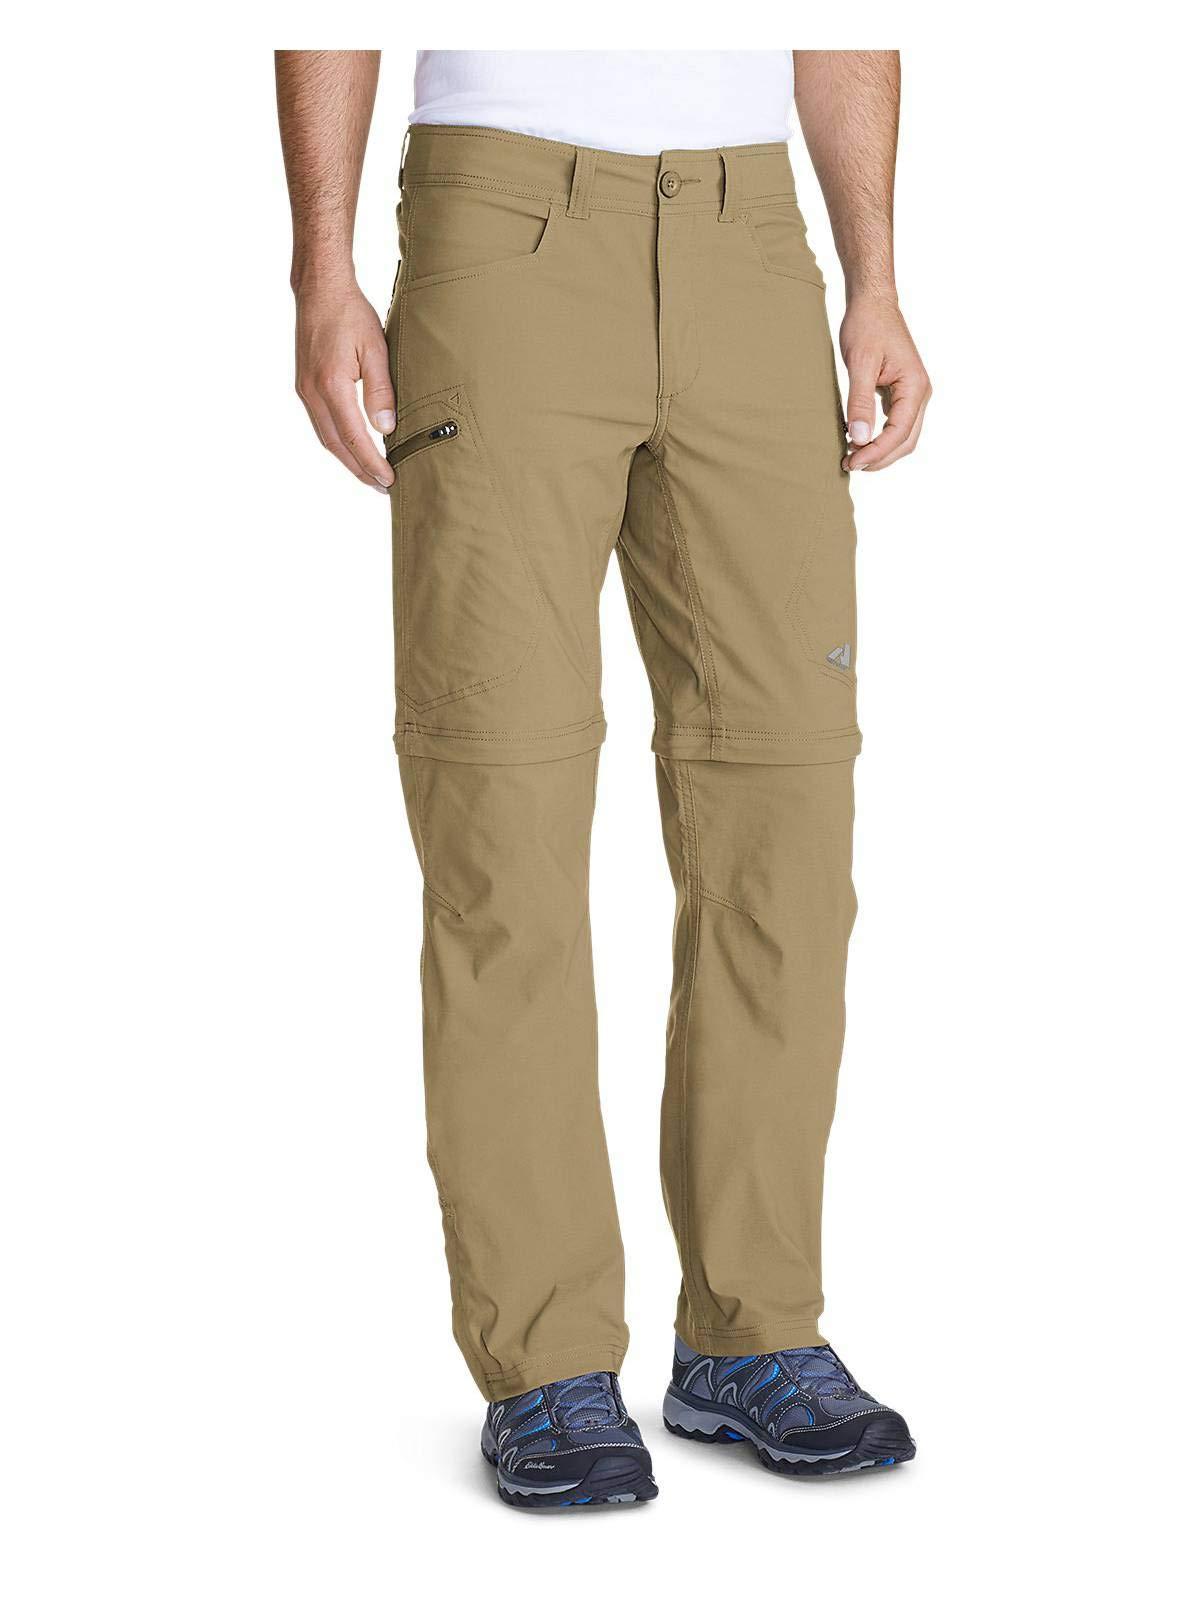 Eddie Bauer Men's Guide Pro Convertible Pants, Saddle Regular 32/30 by Eddie Bauer (Image #1)